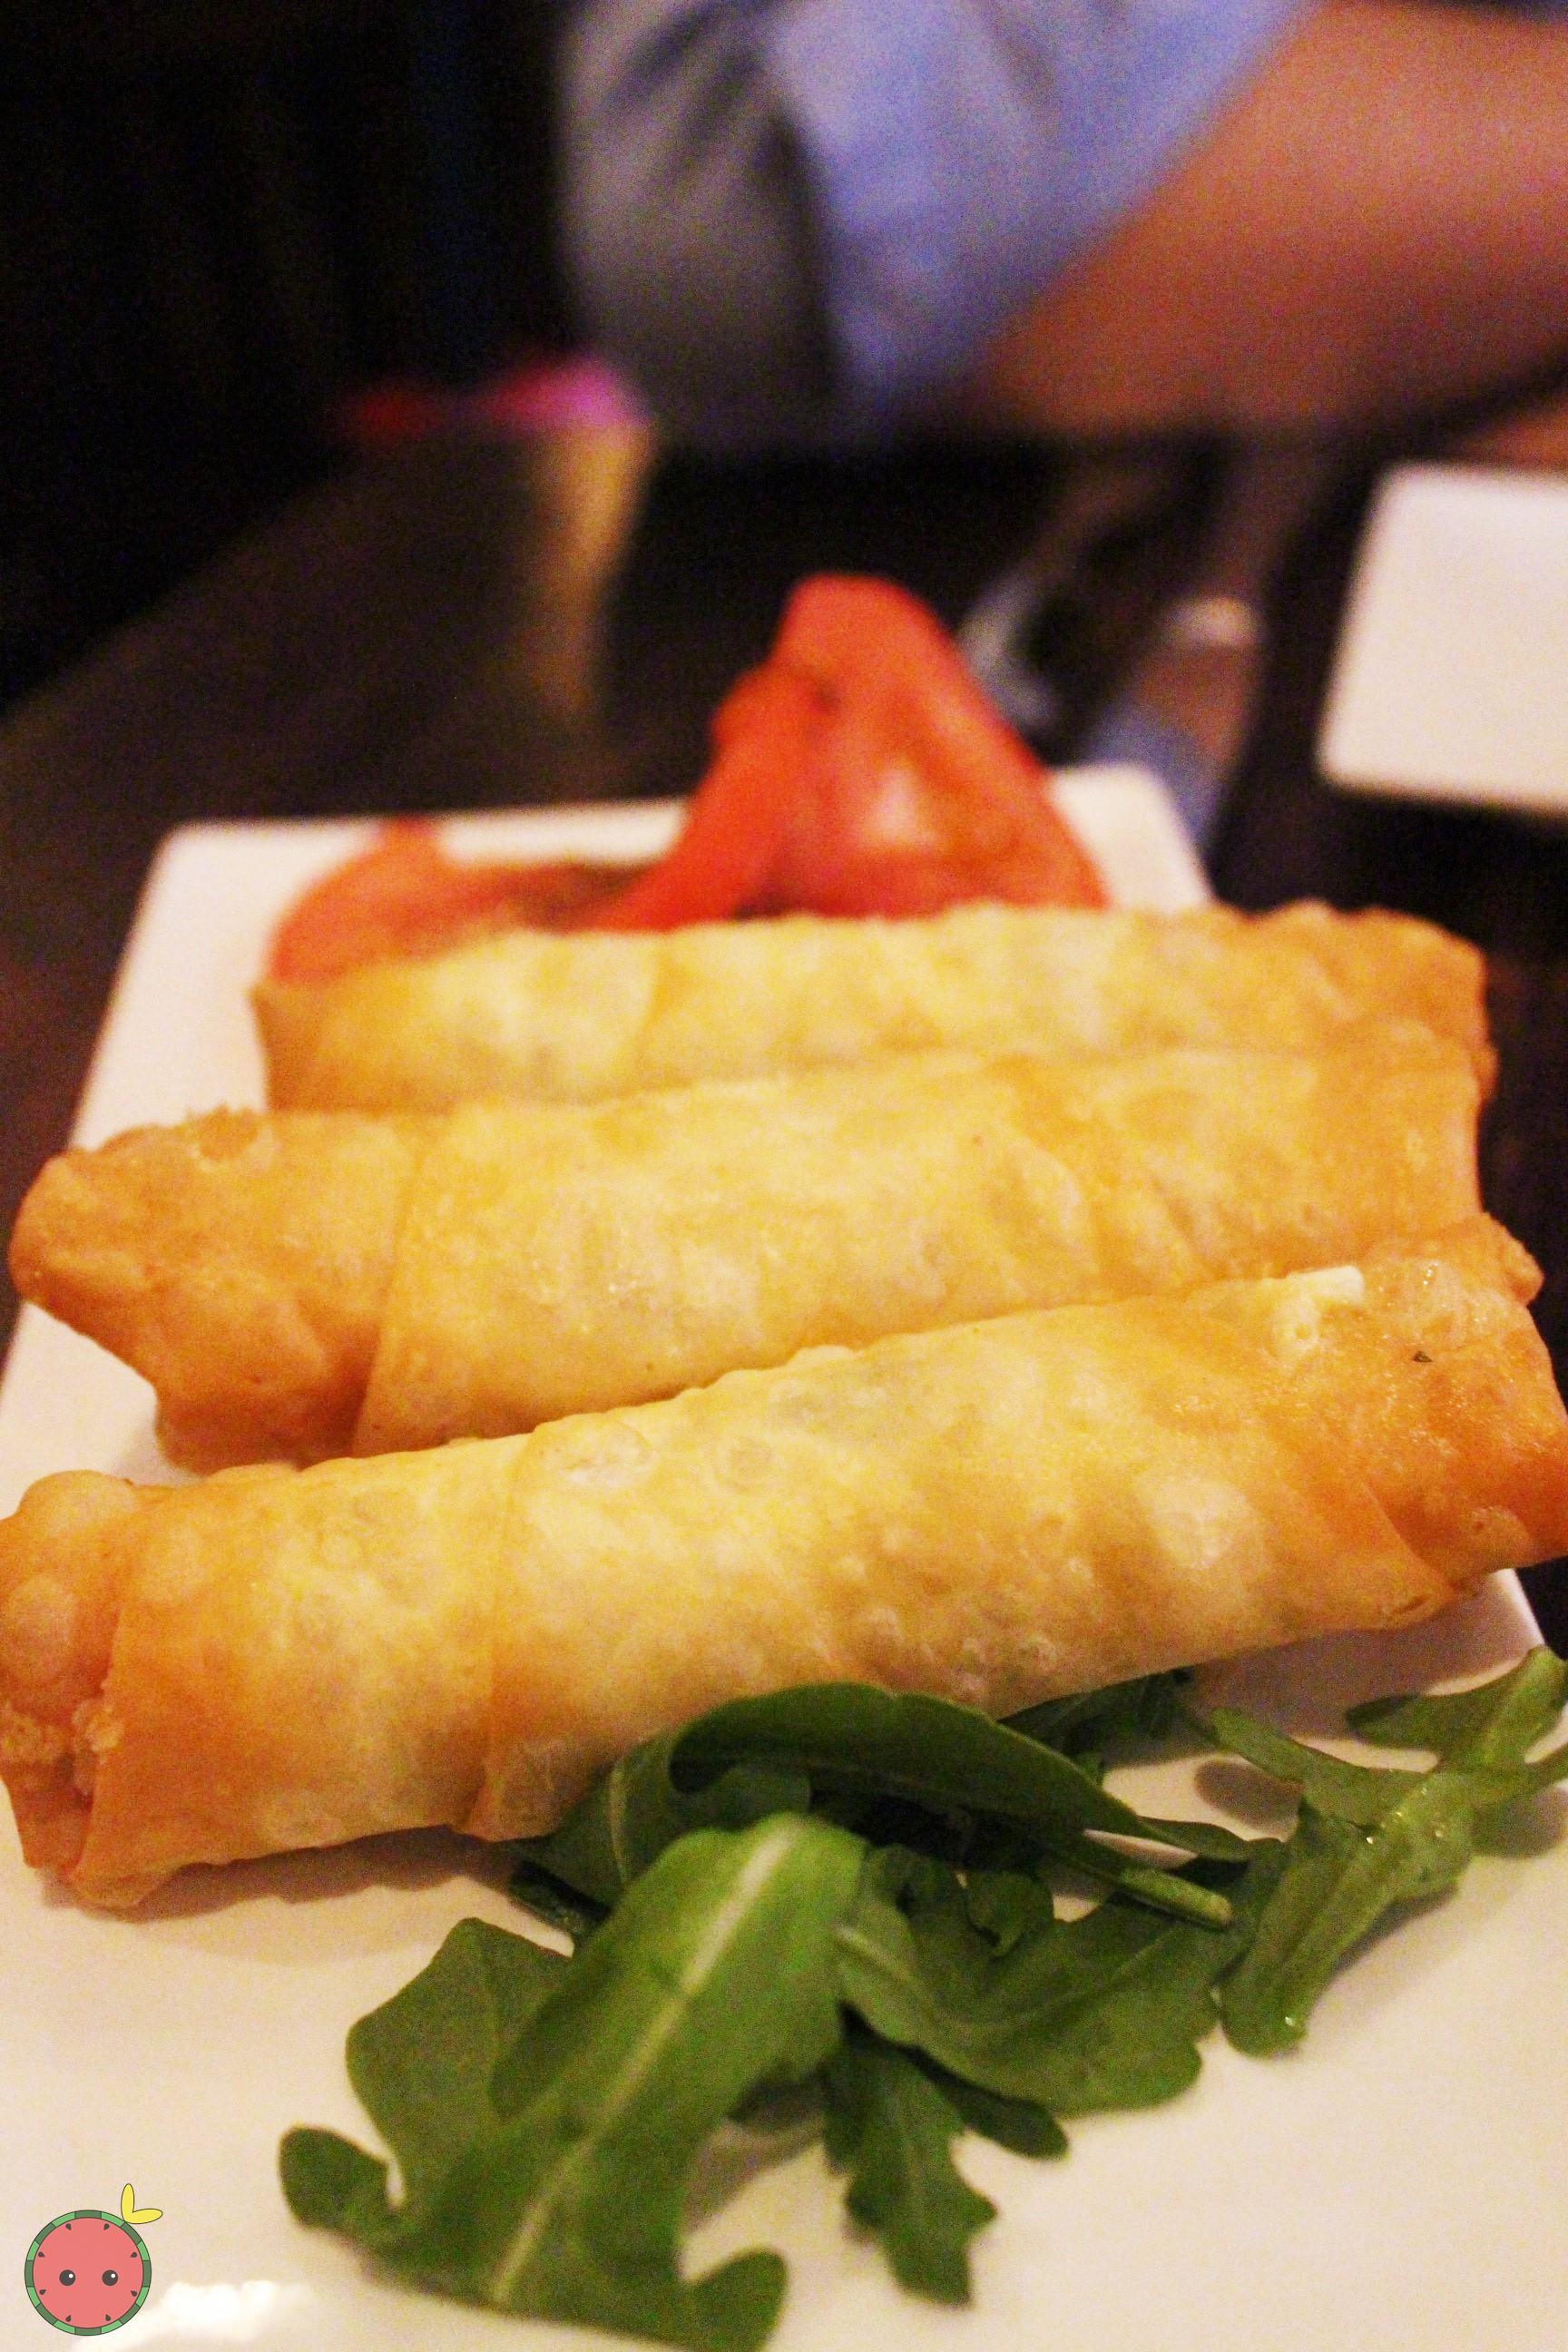 Phyllo rolls stuffed with feta cheese, parsley